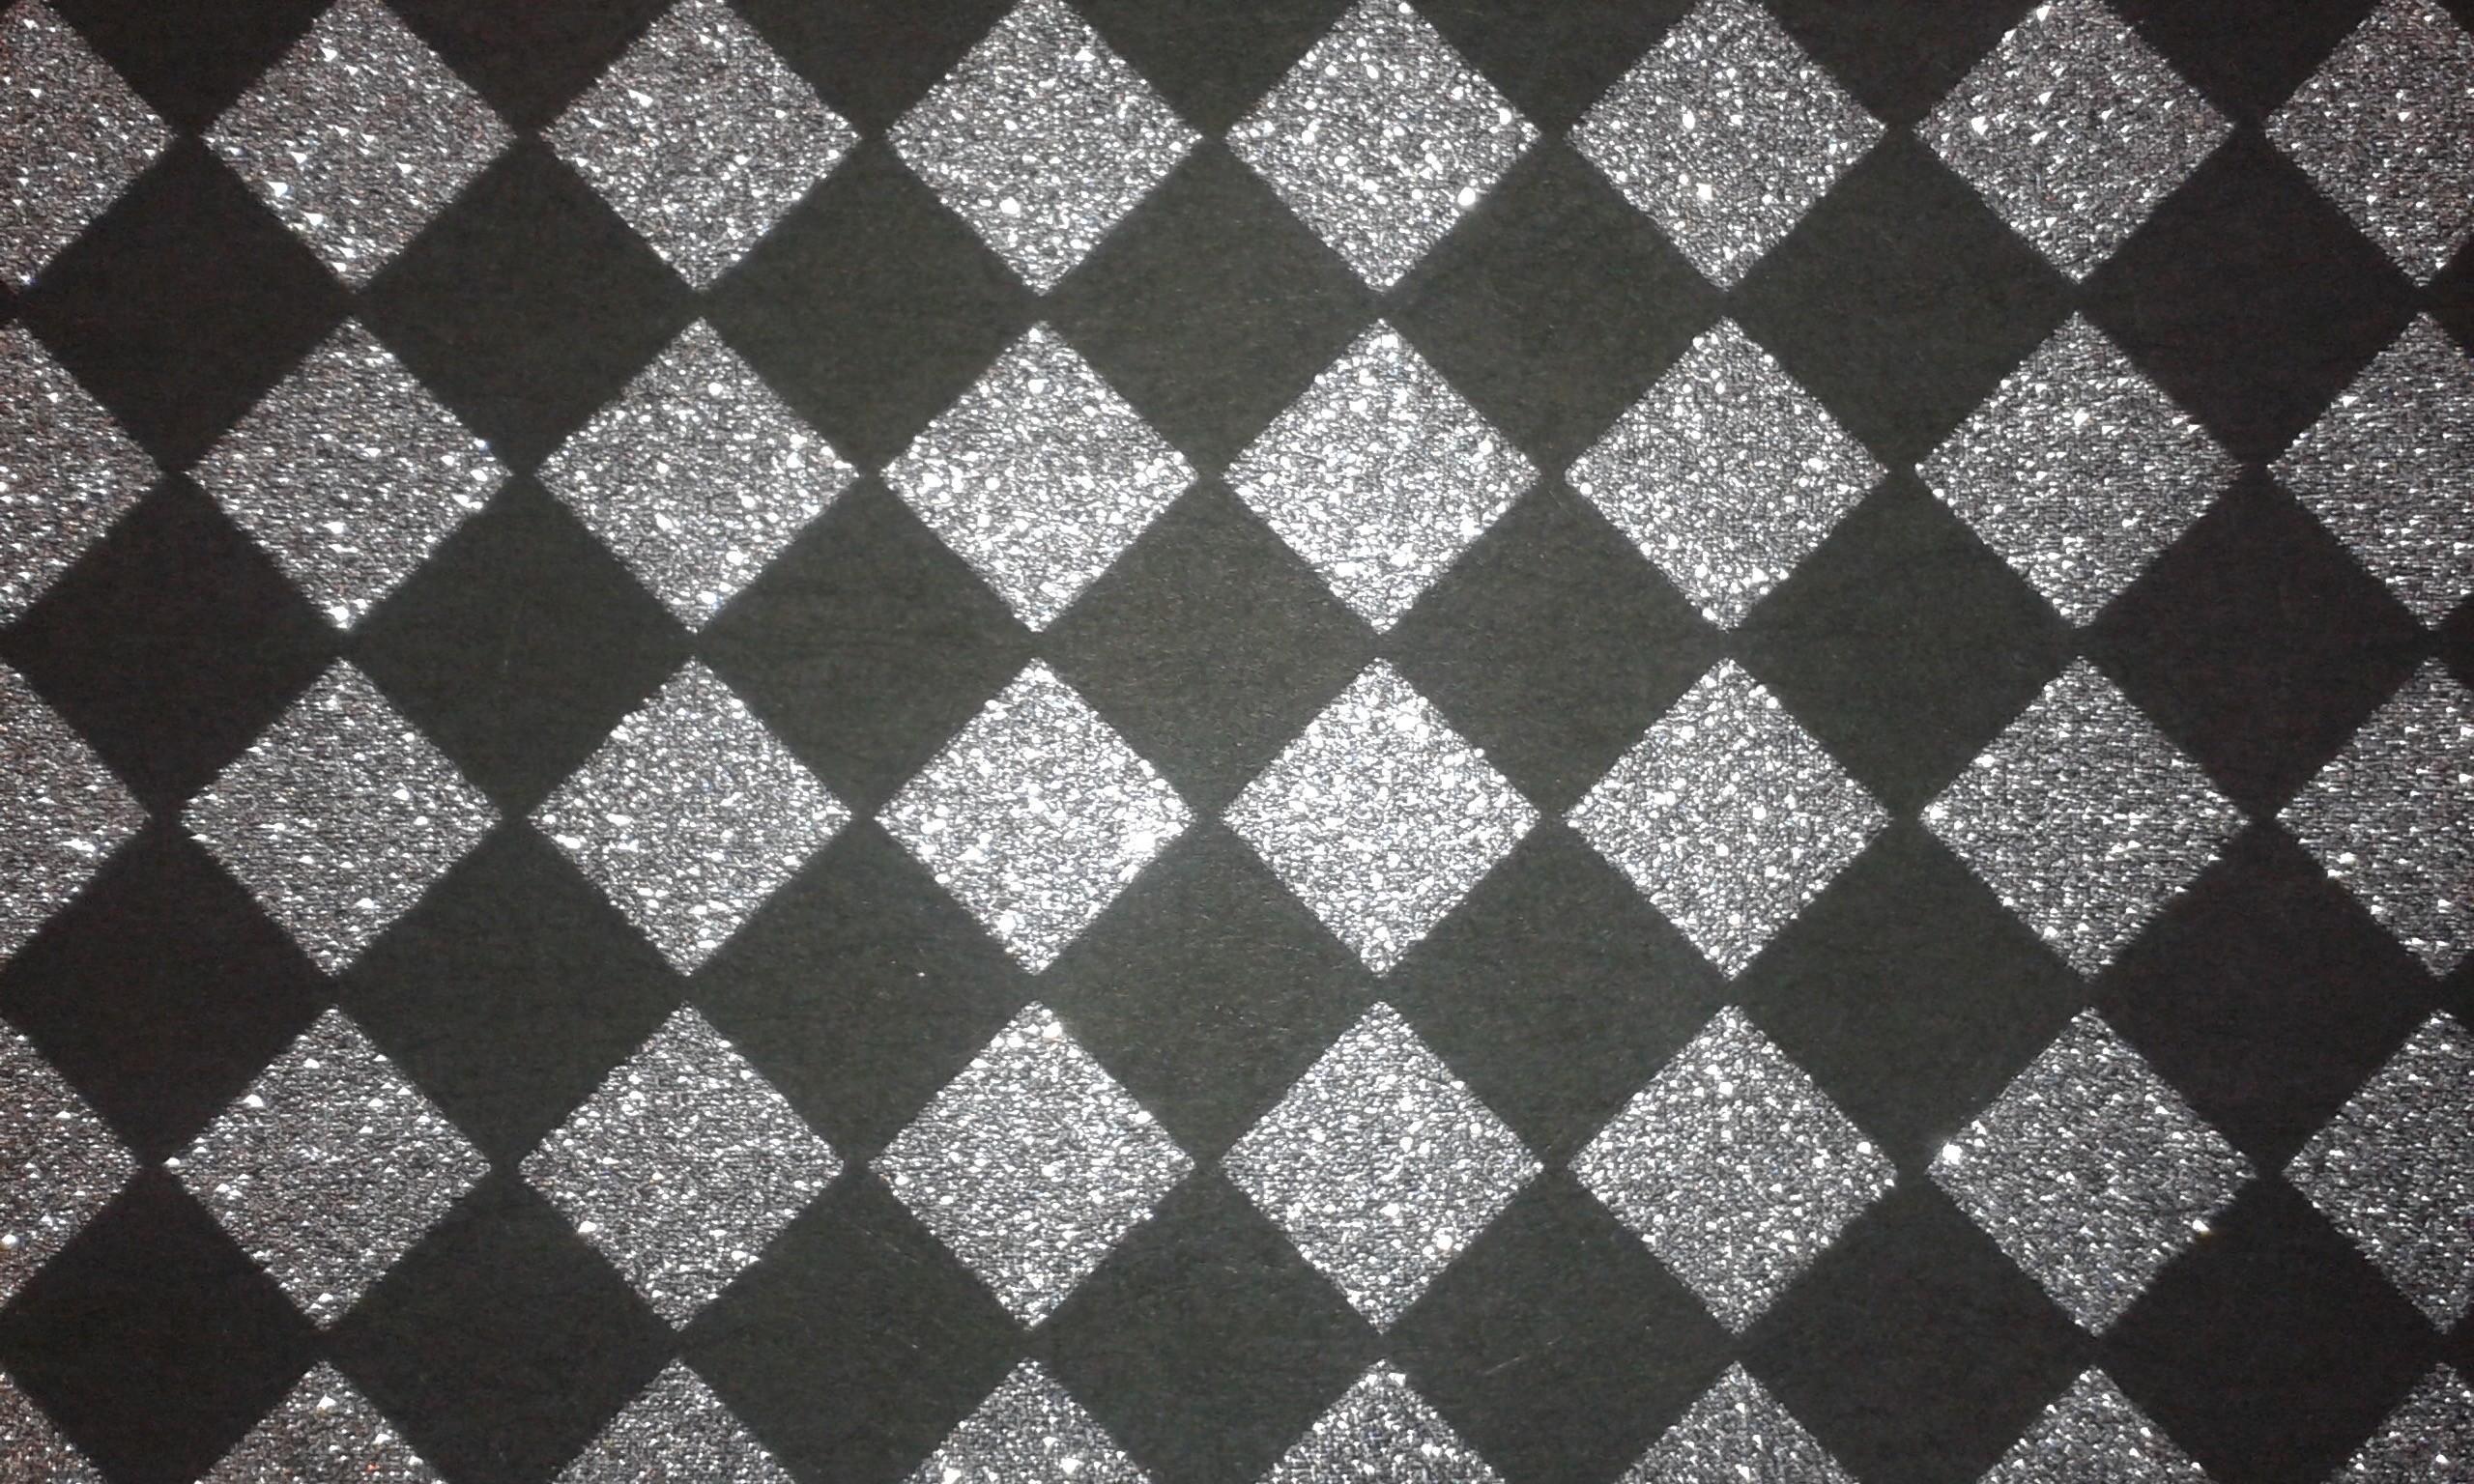 Silver Diamond Glitter Wallpaper Visual Merchandising Decorative Fabric &  Wallcoverings for Retail, Window Display,